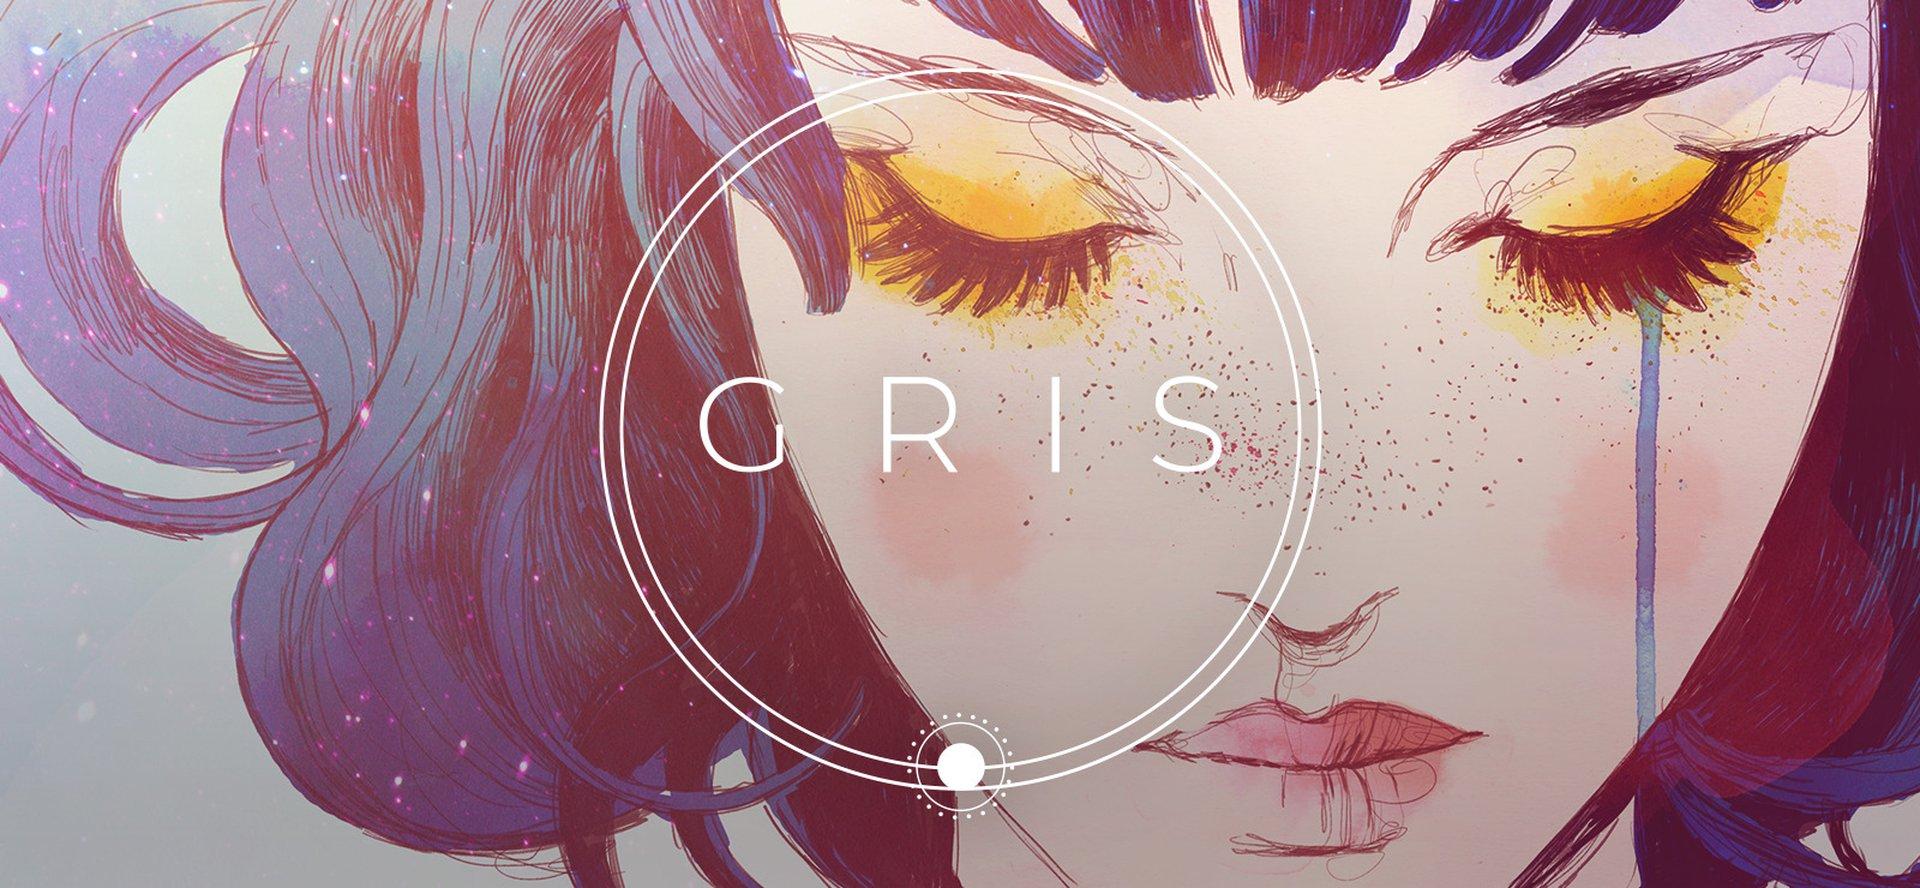 GRIS Video